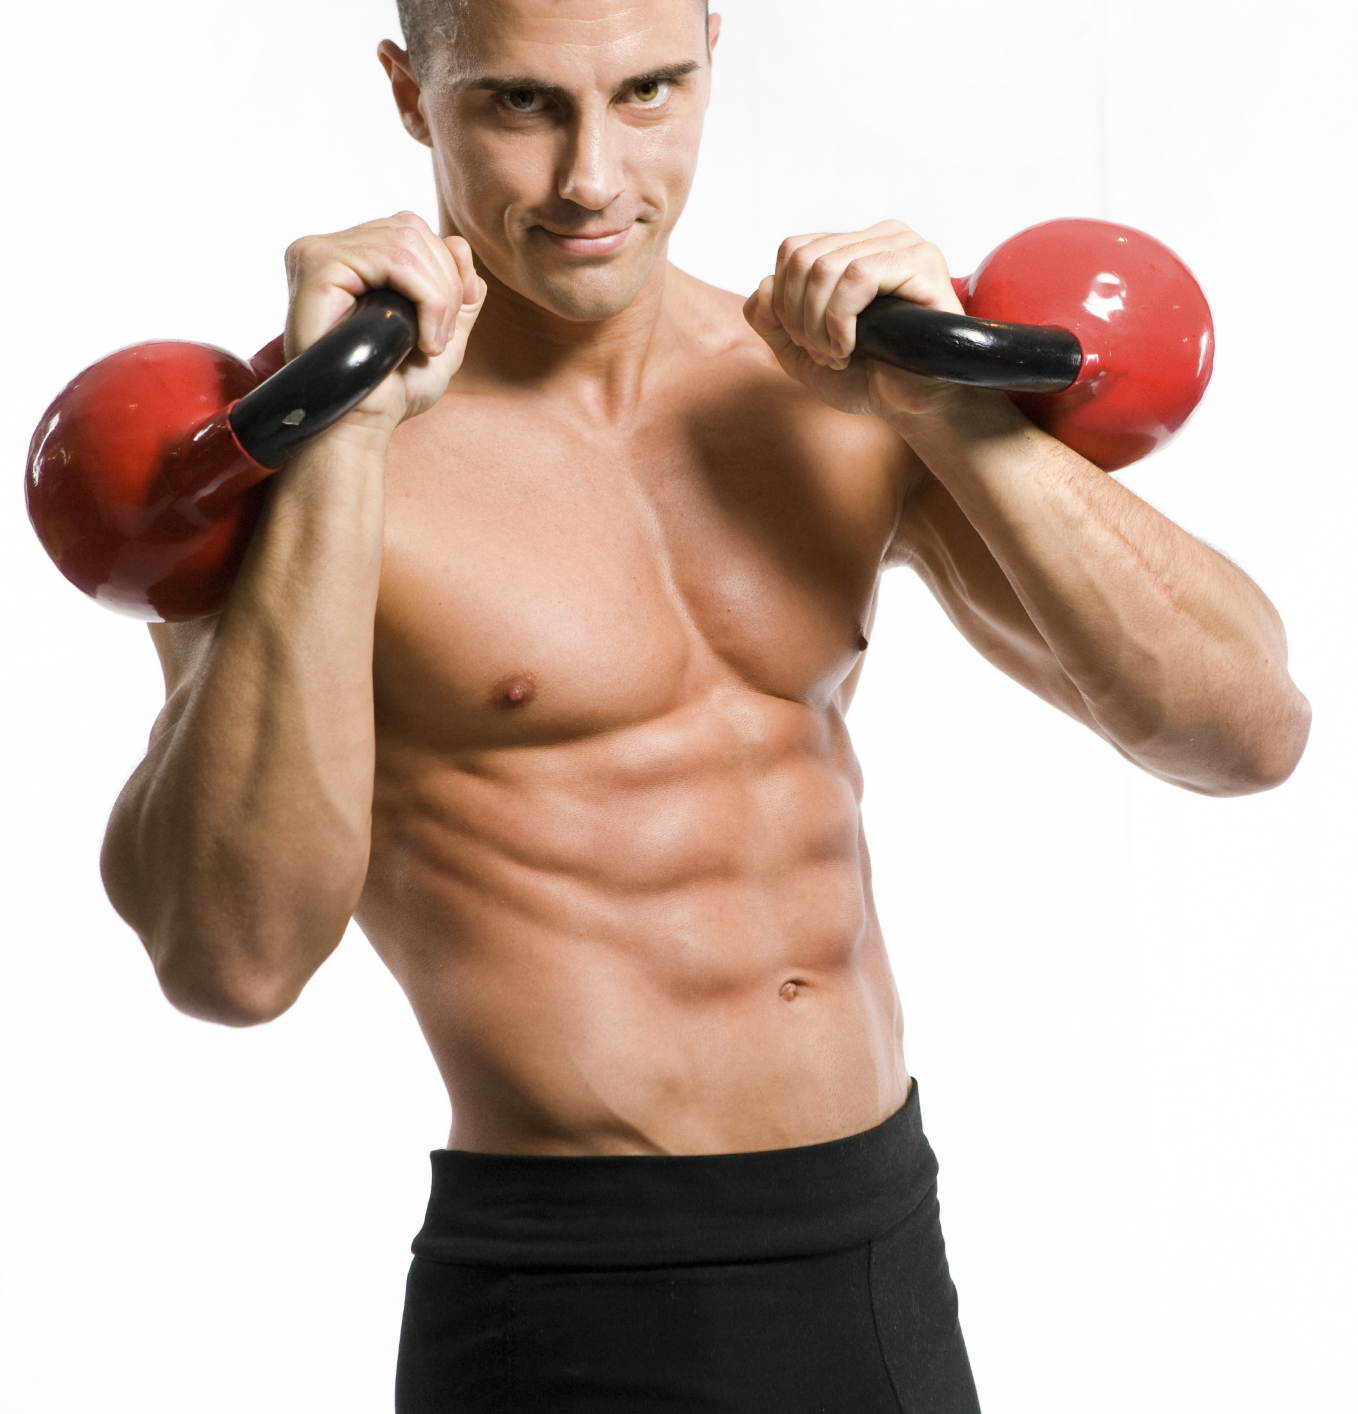 Man Workout: Warning: Kettlebells Are Dangerous